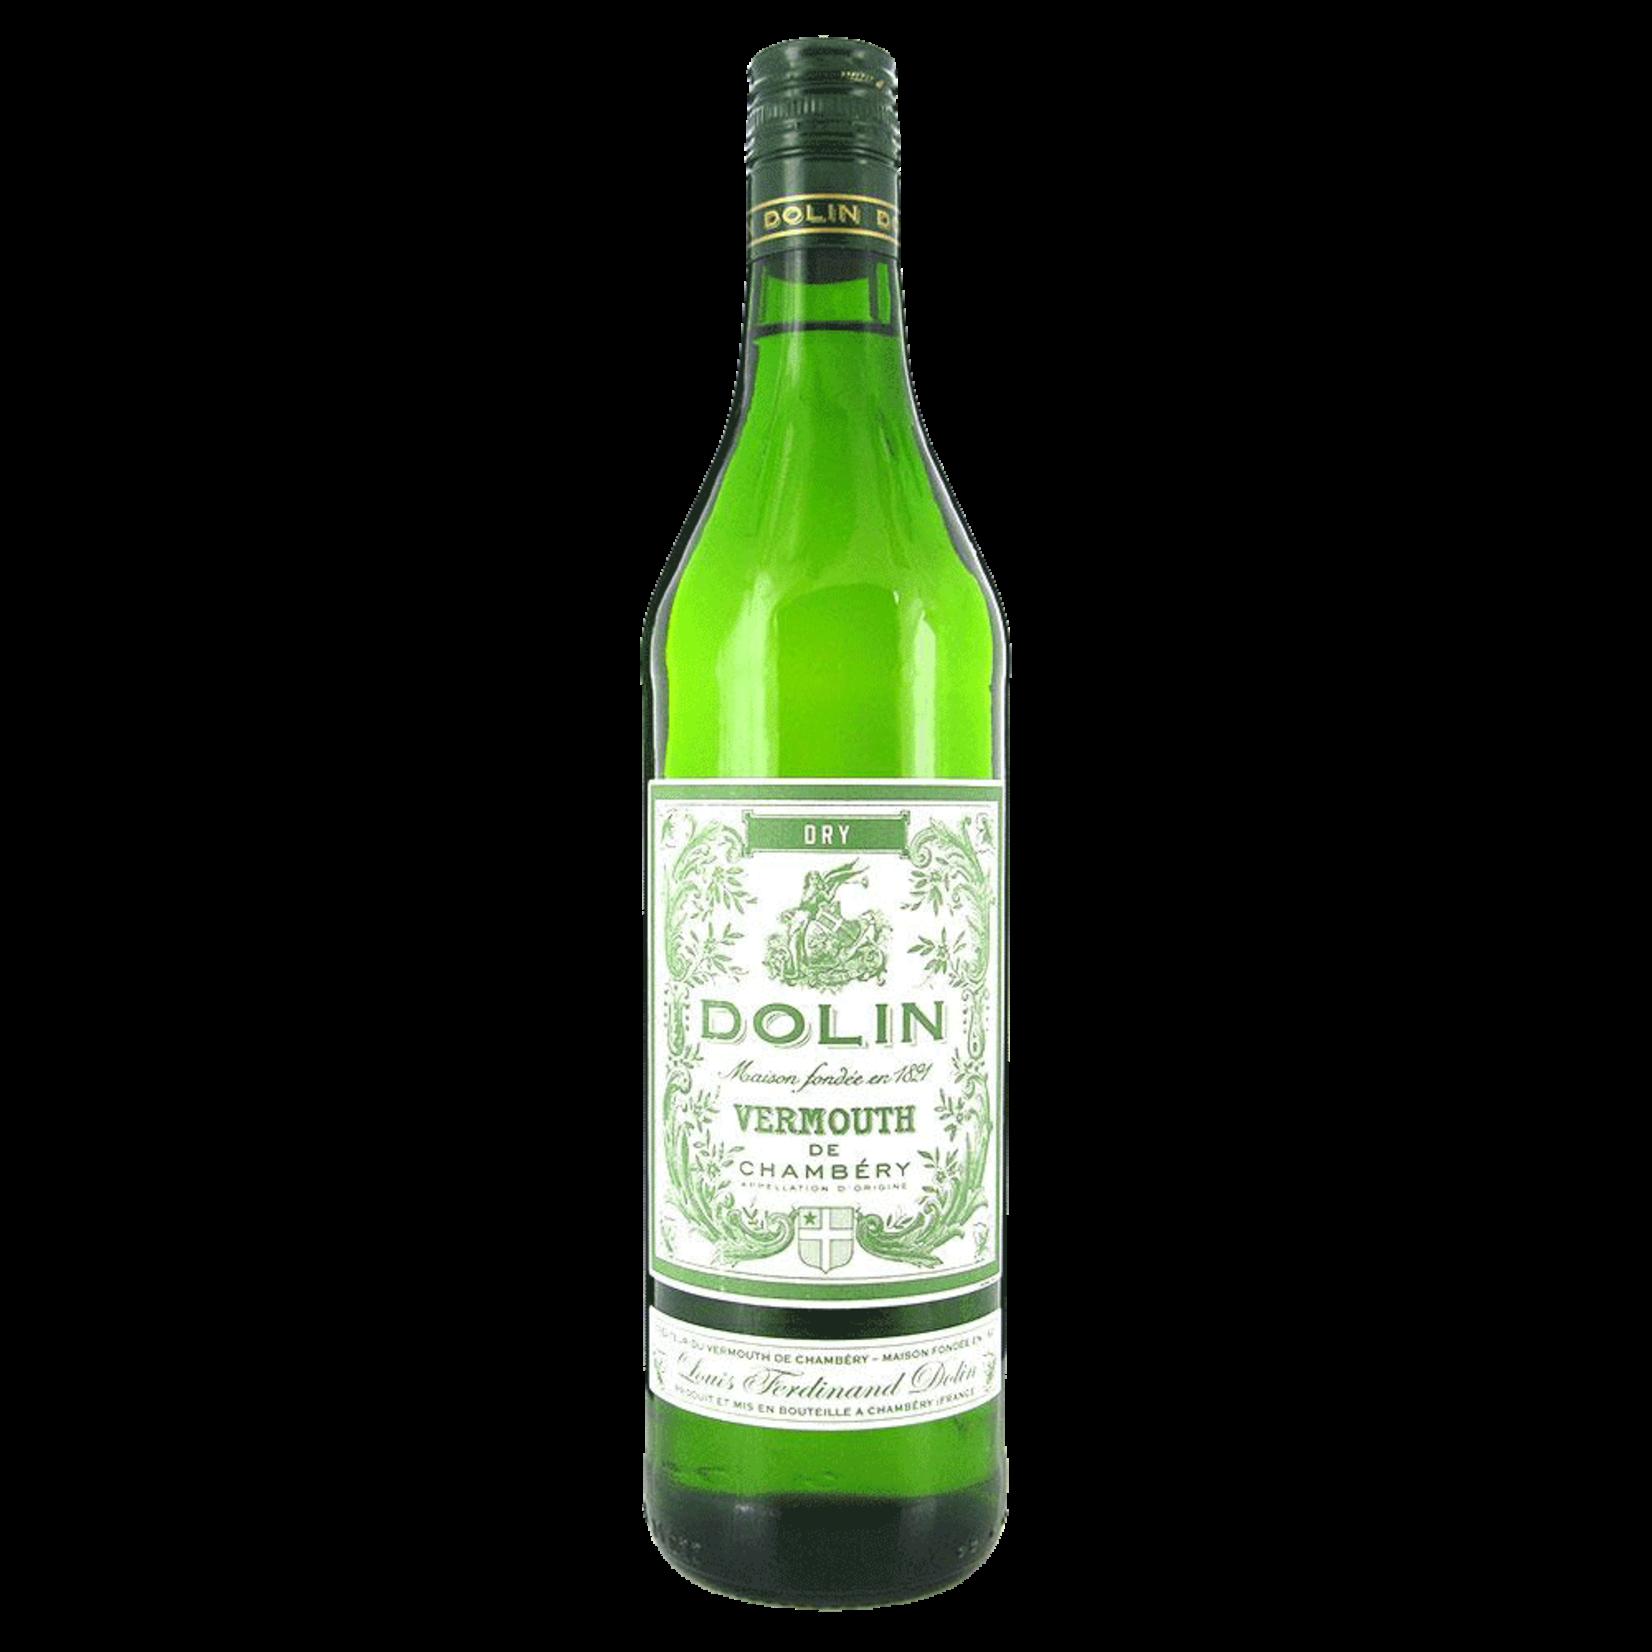 Wine Dolin Dry Vermouth de Chambéry